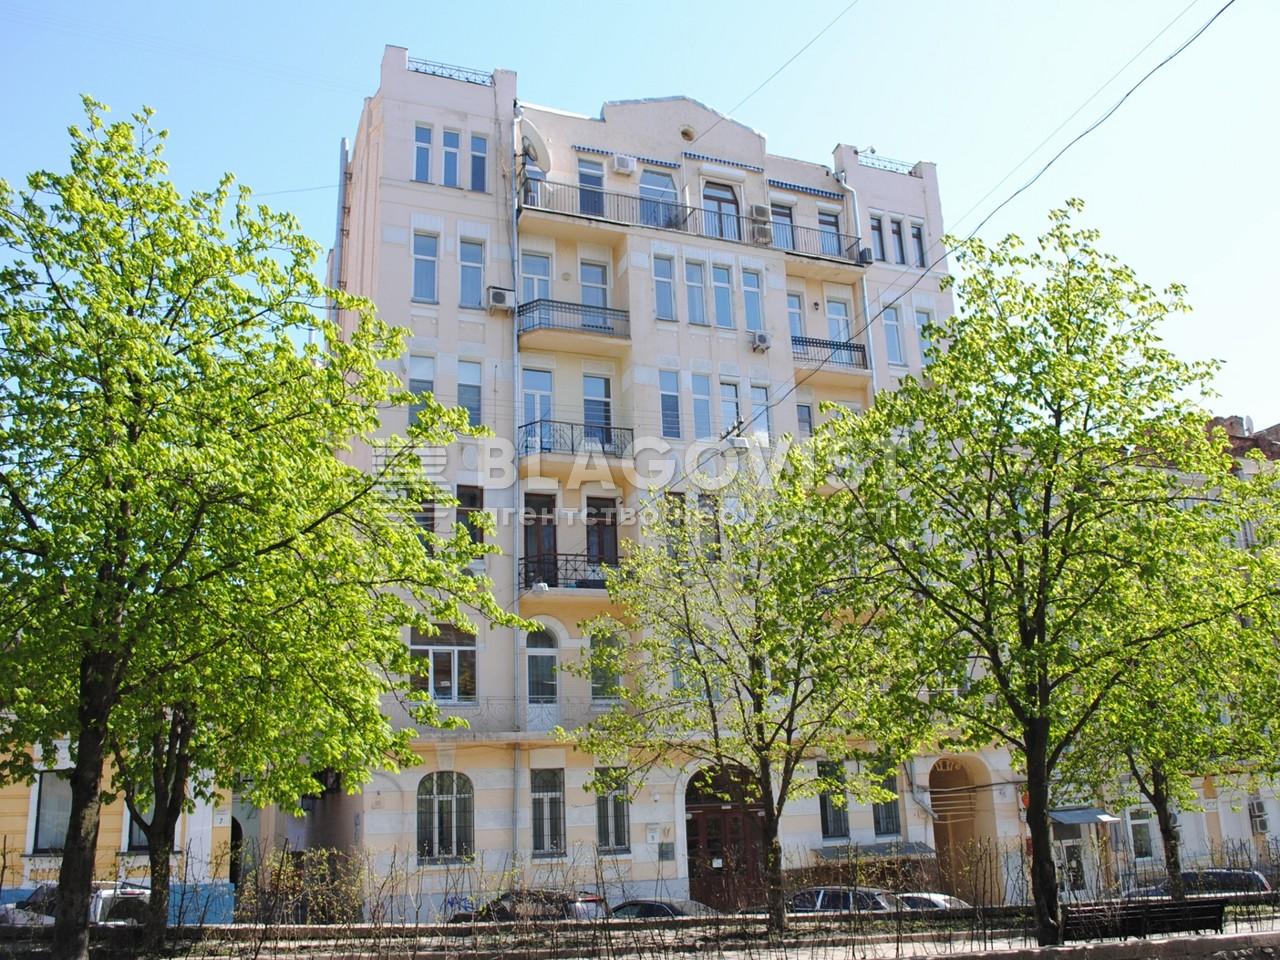 Квартира E-36351, Антоновича (Горького), 9, Киев - Фото 2